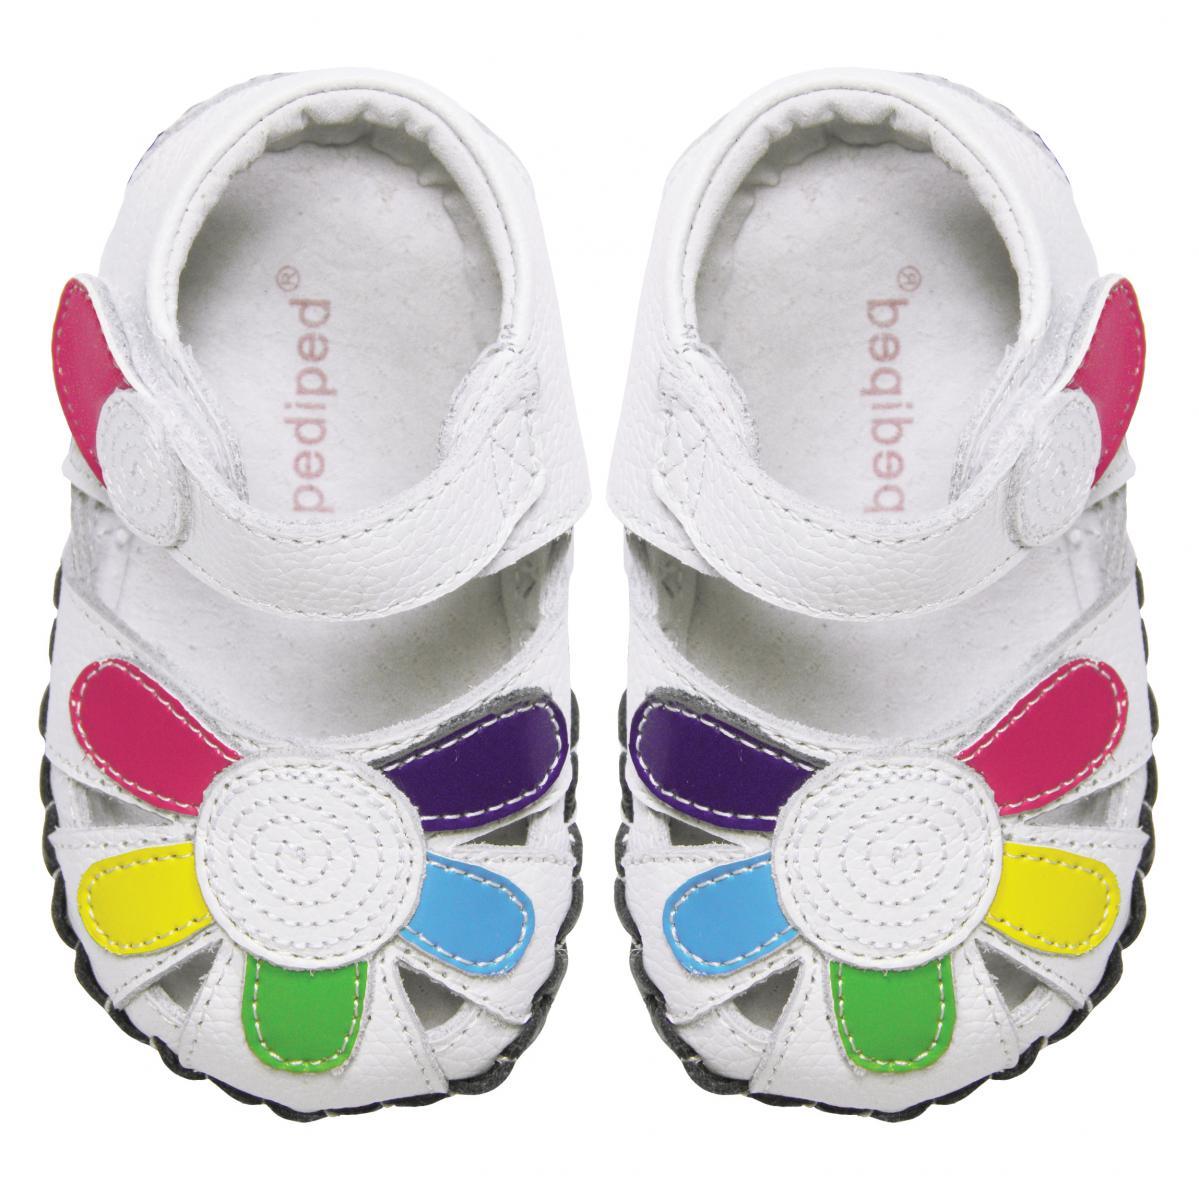 pedipeds-originals-daisy-muliti.jpg